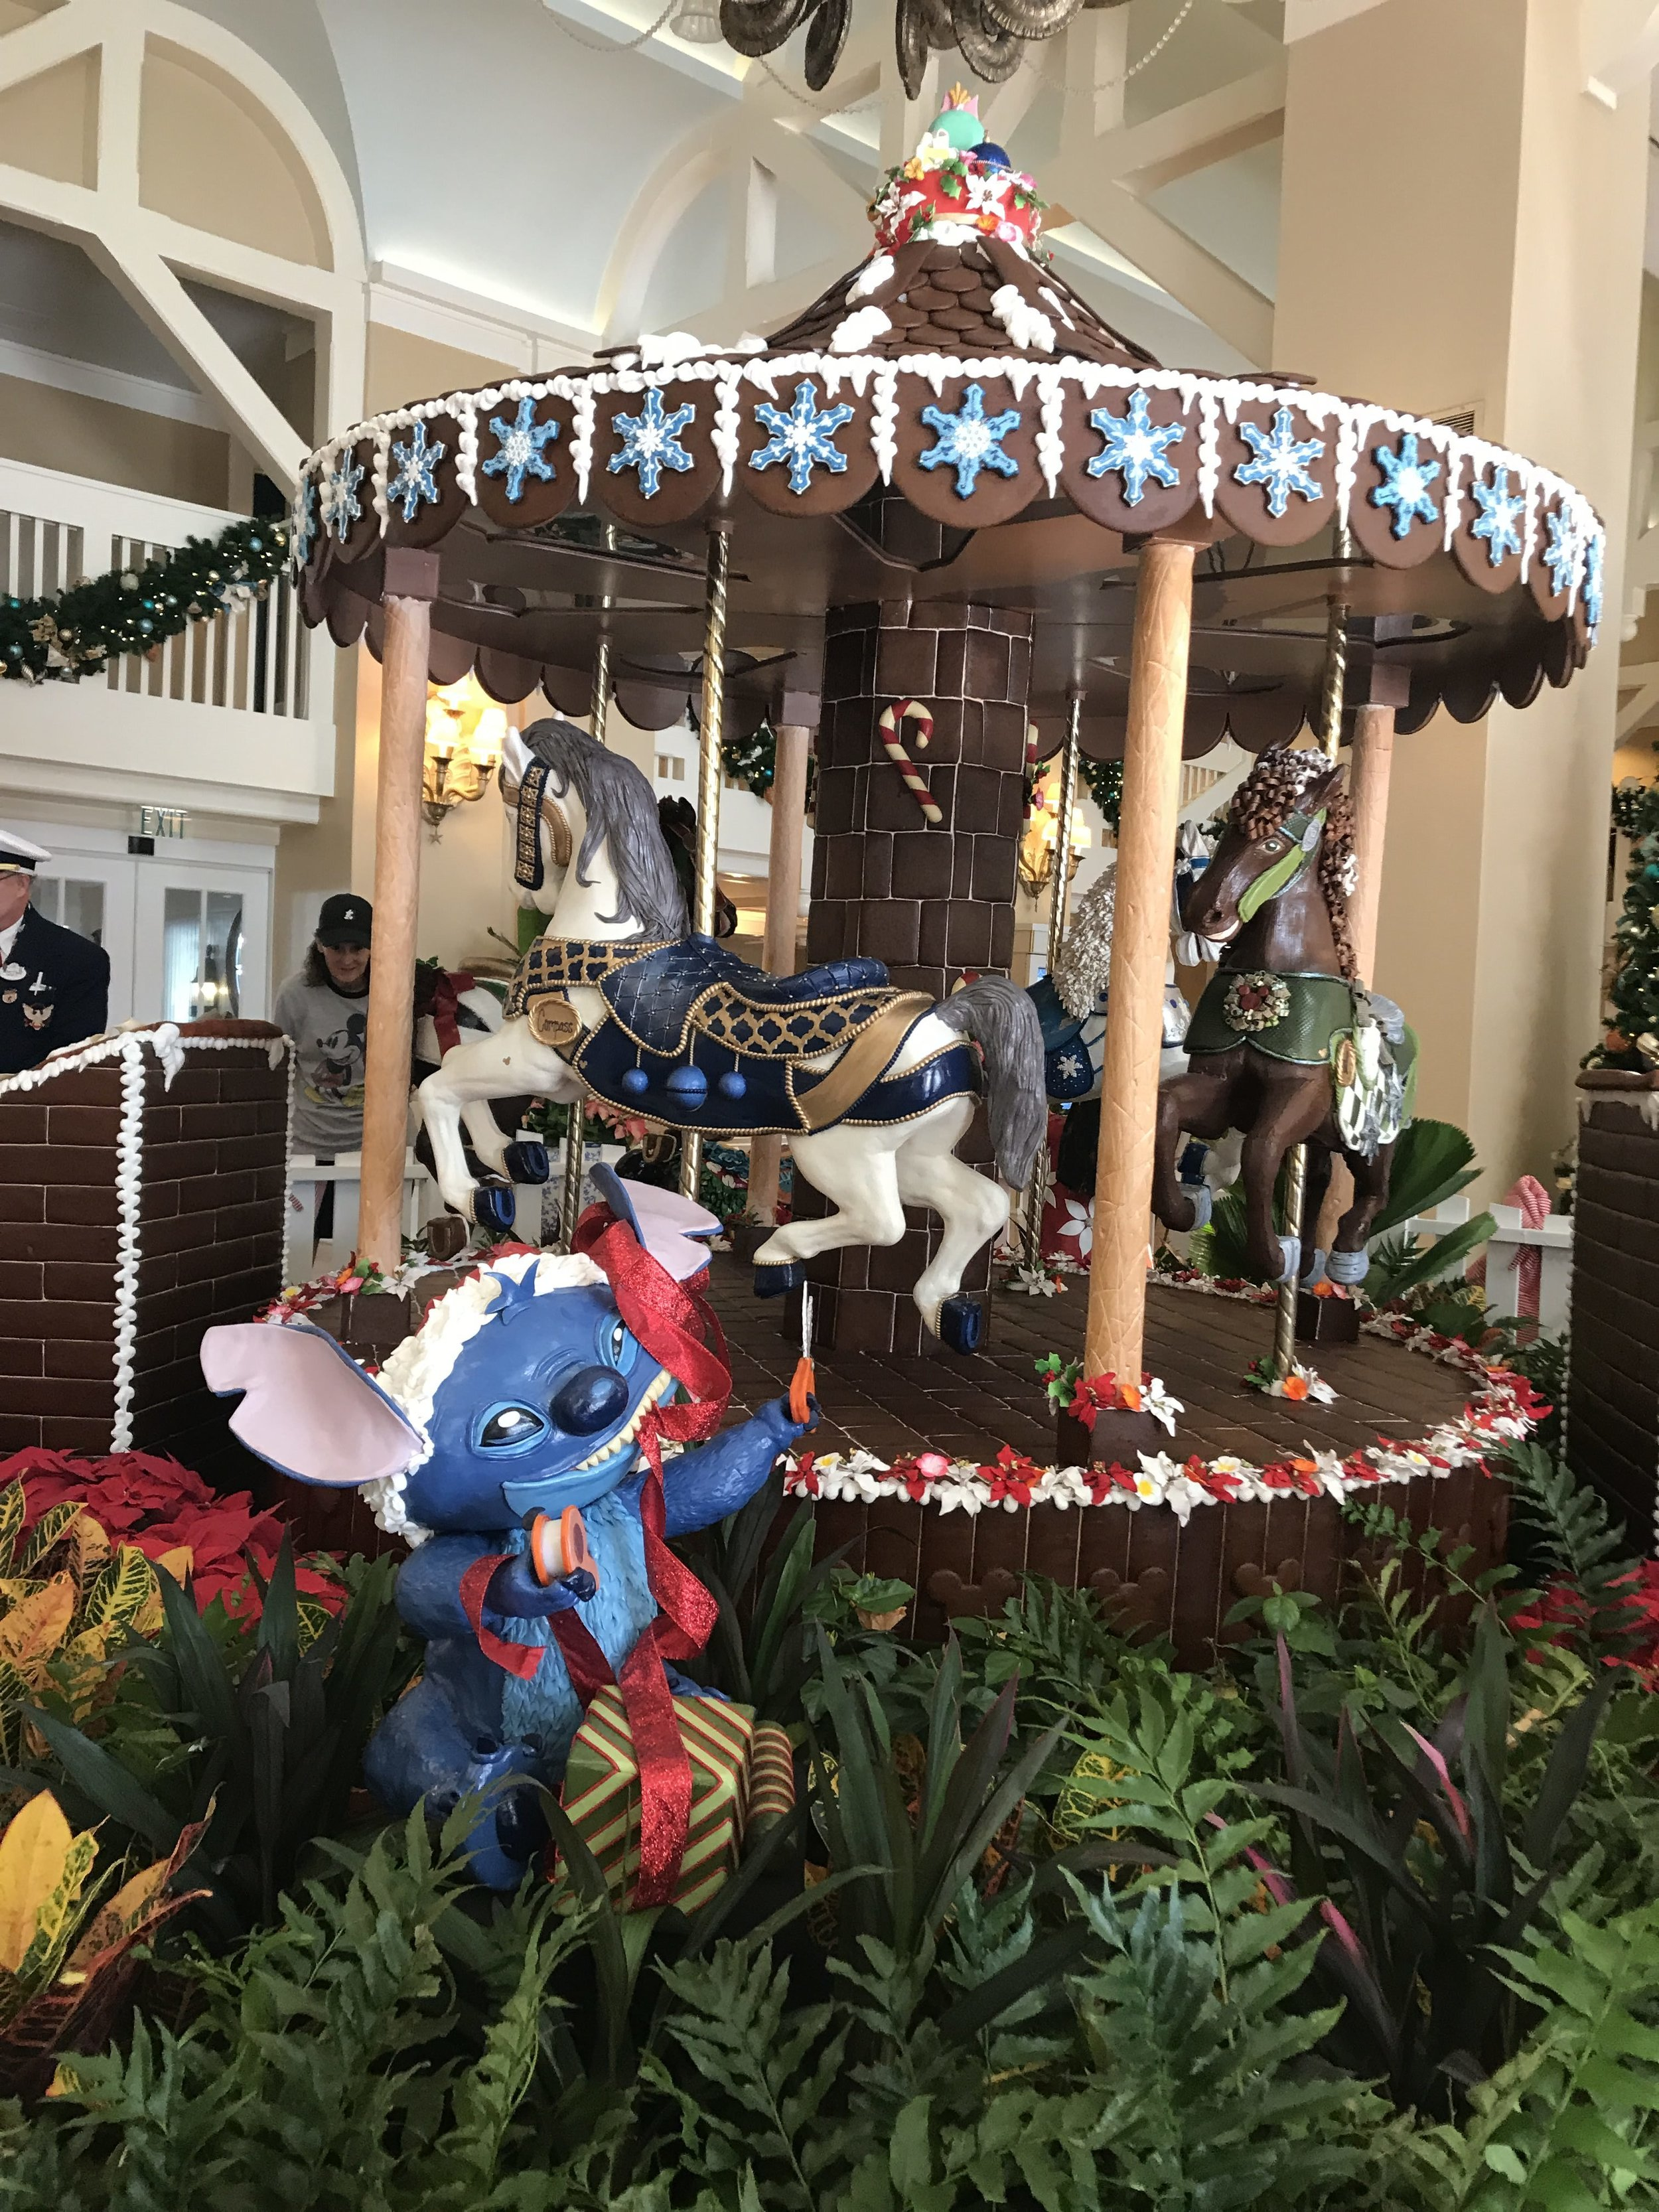 Disney's Beach Club's Chocolate Carousel Display featuring Lilo and Stitch